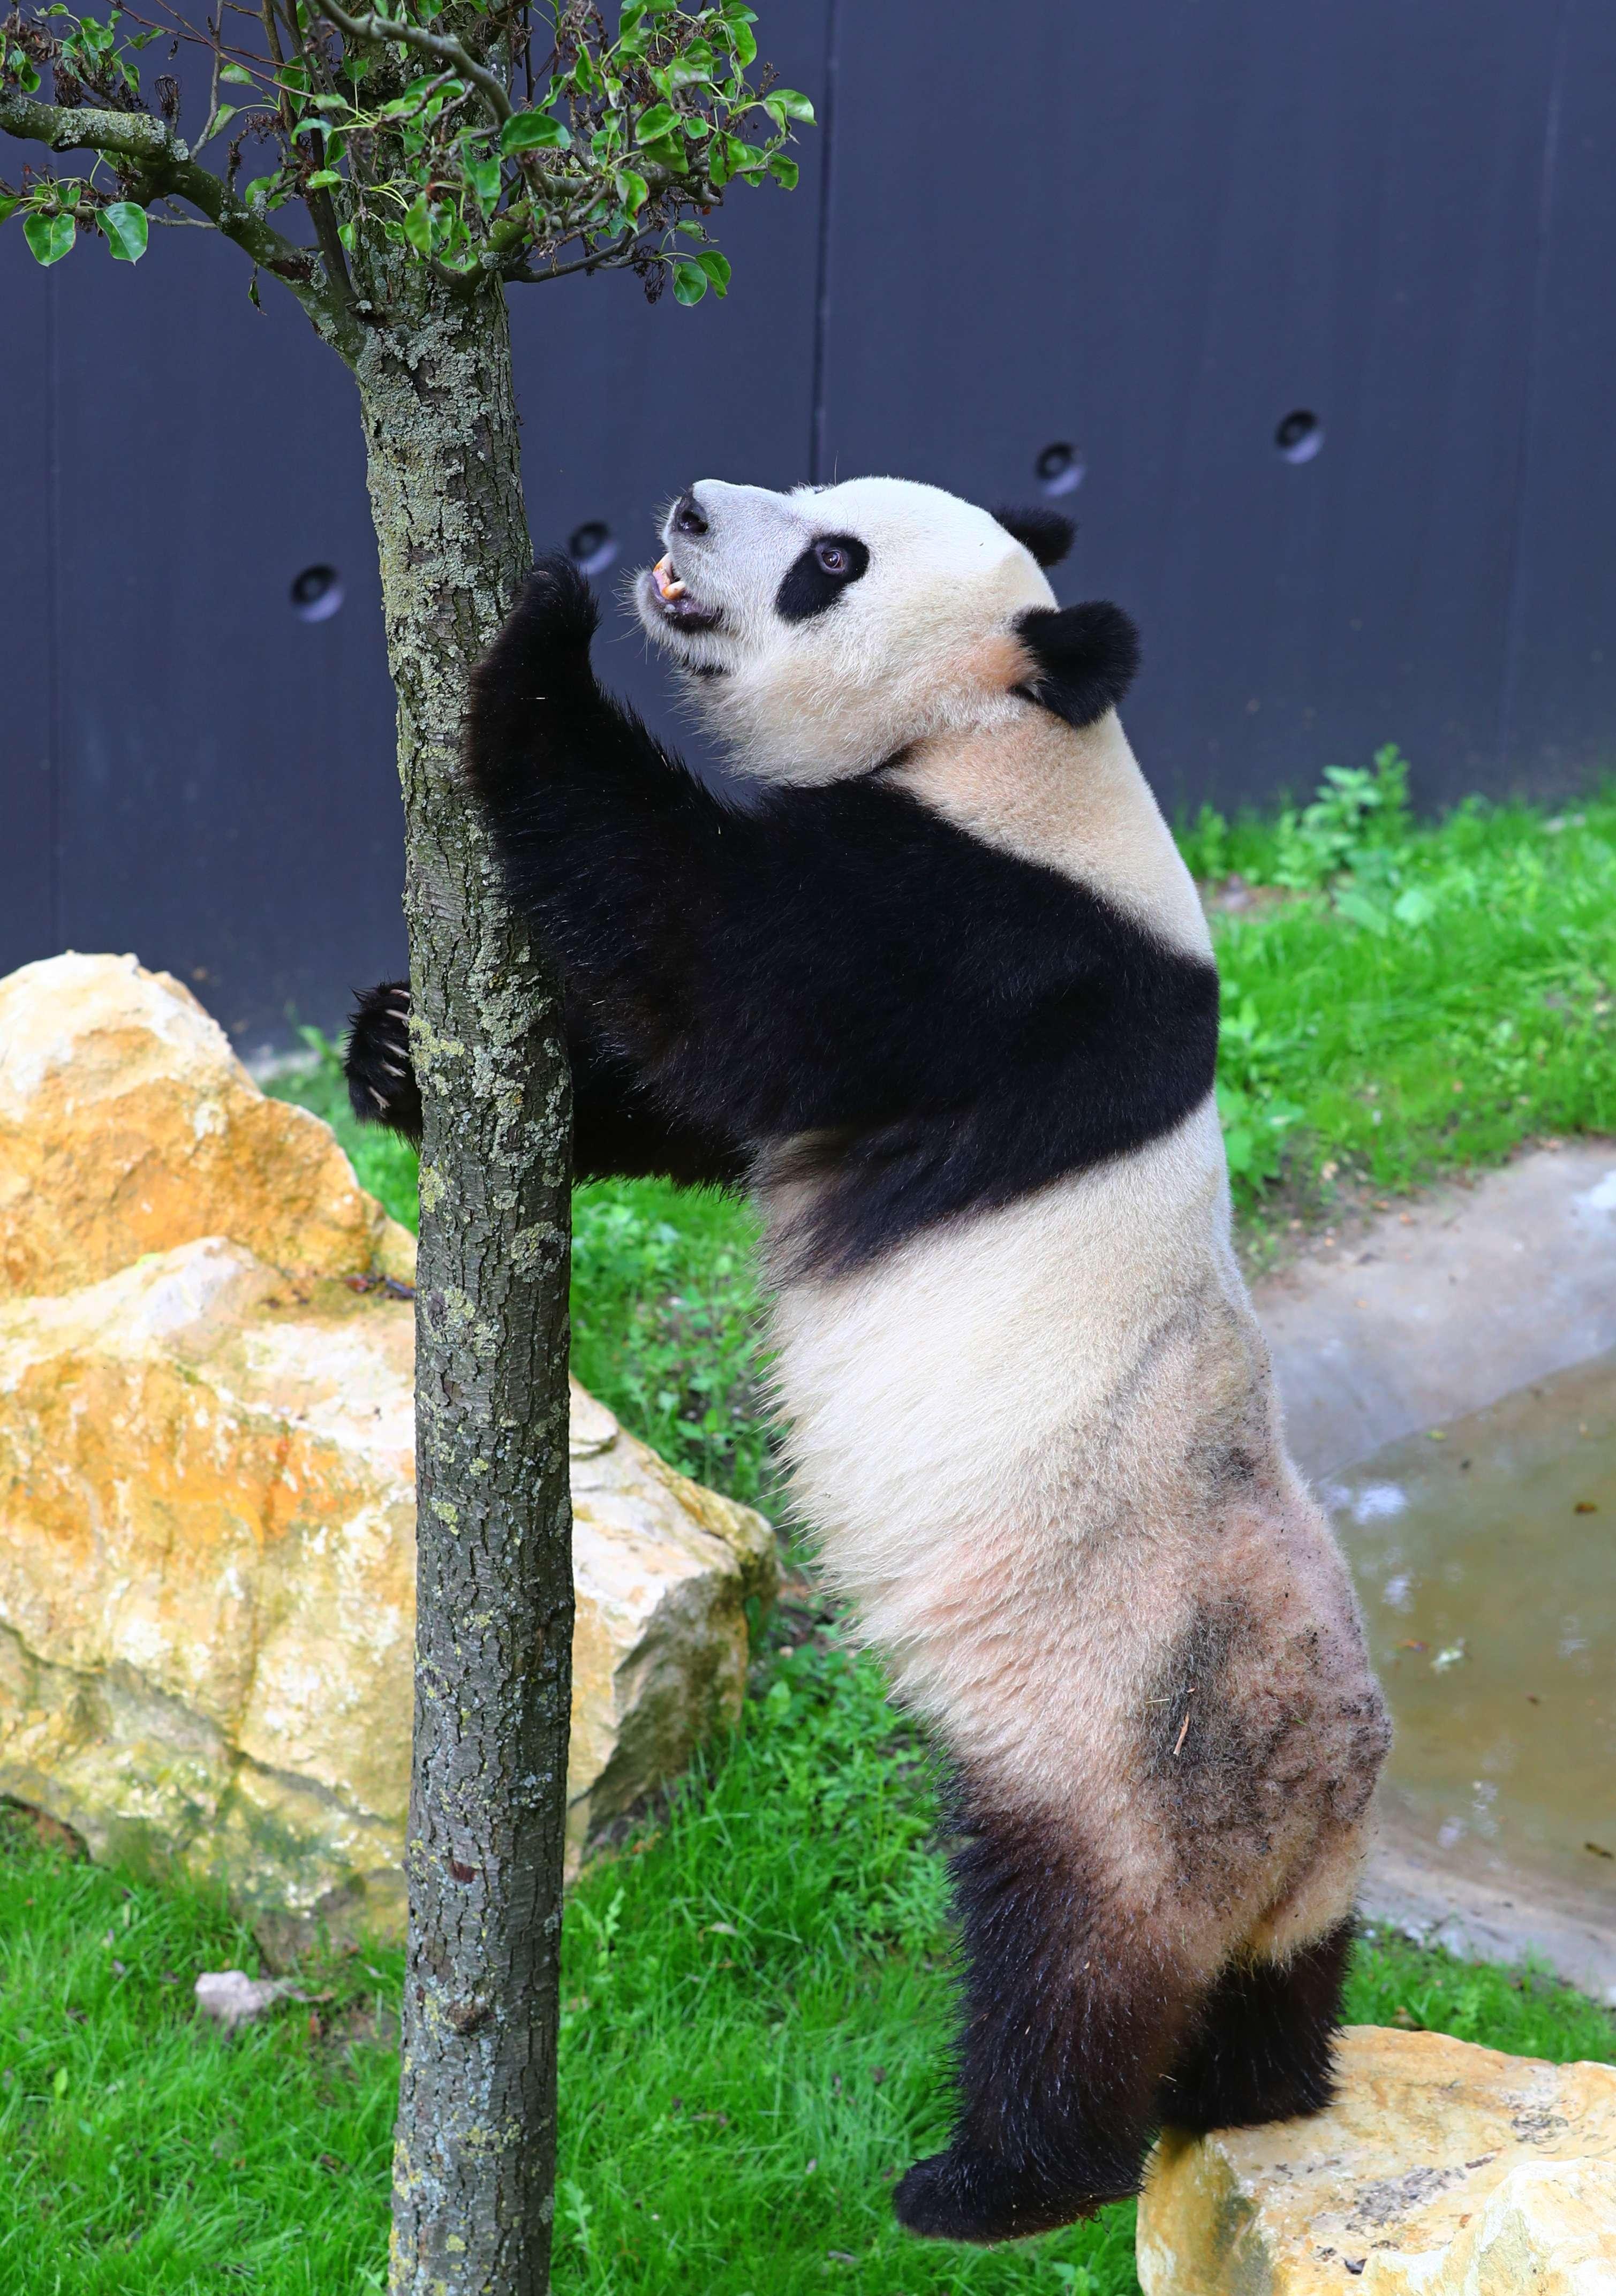 Two giant pandas make enchanting debut at Dutch zoo